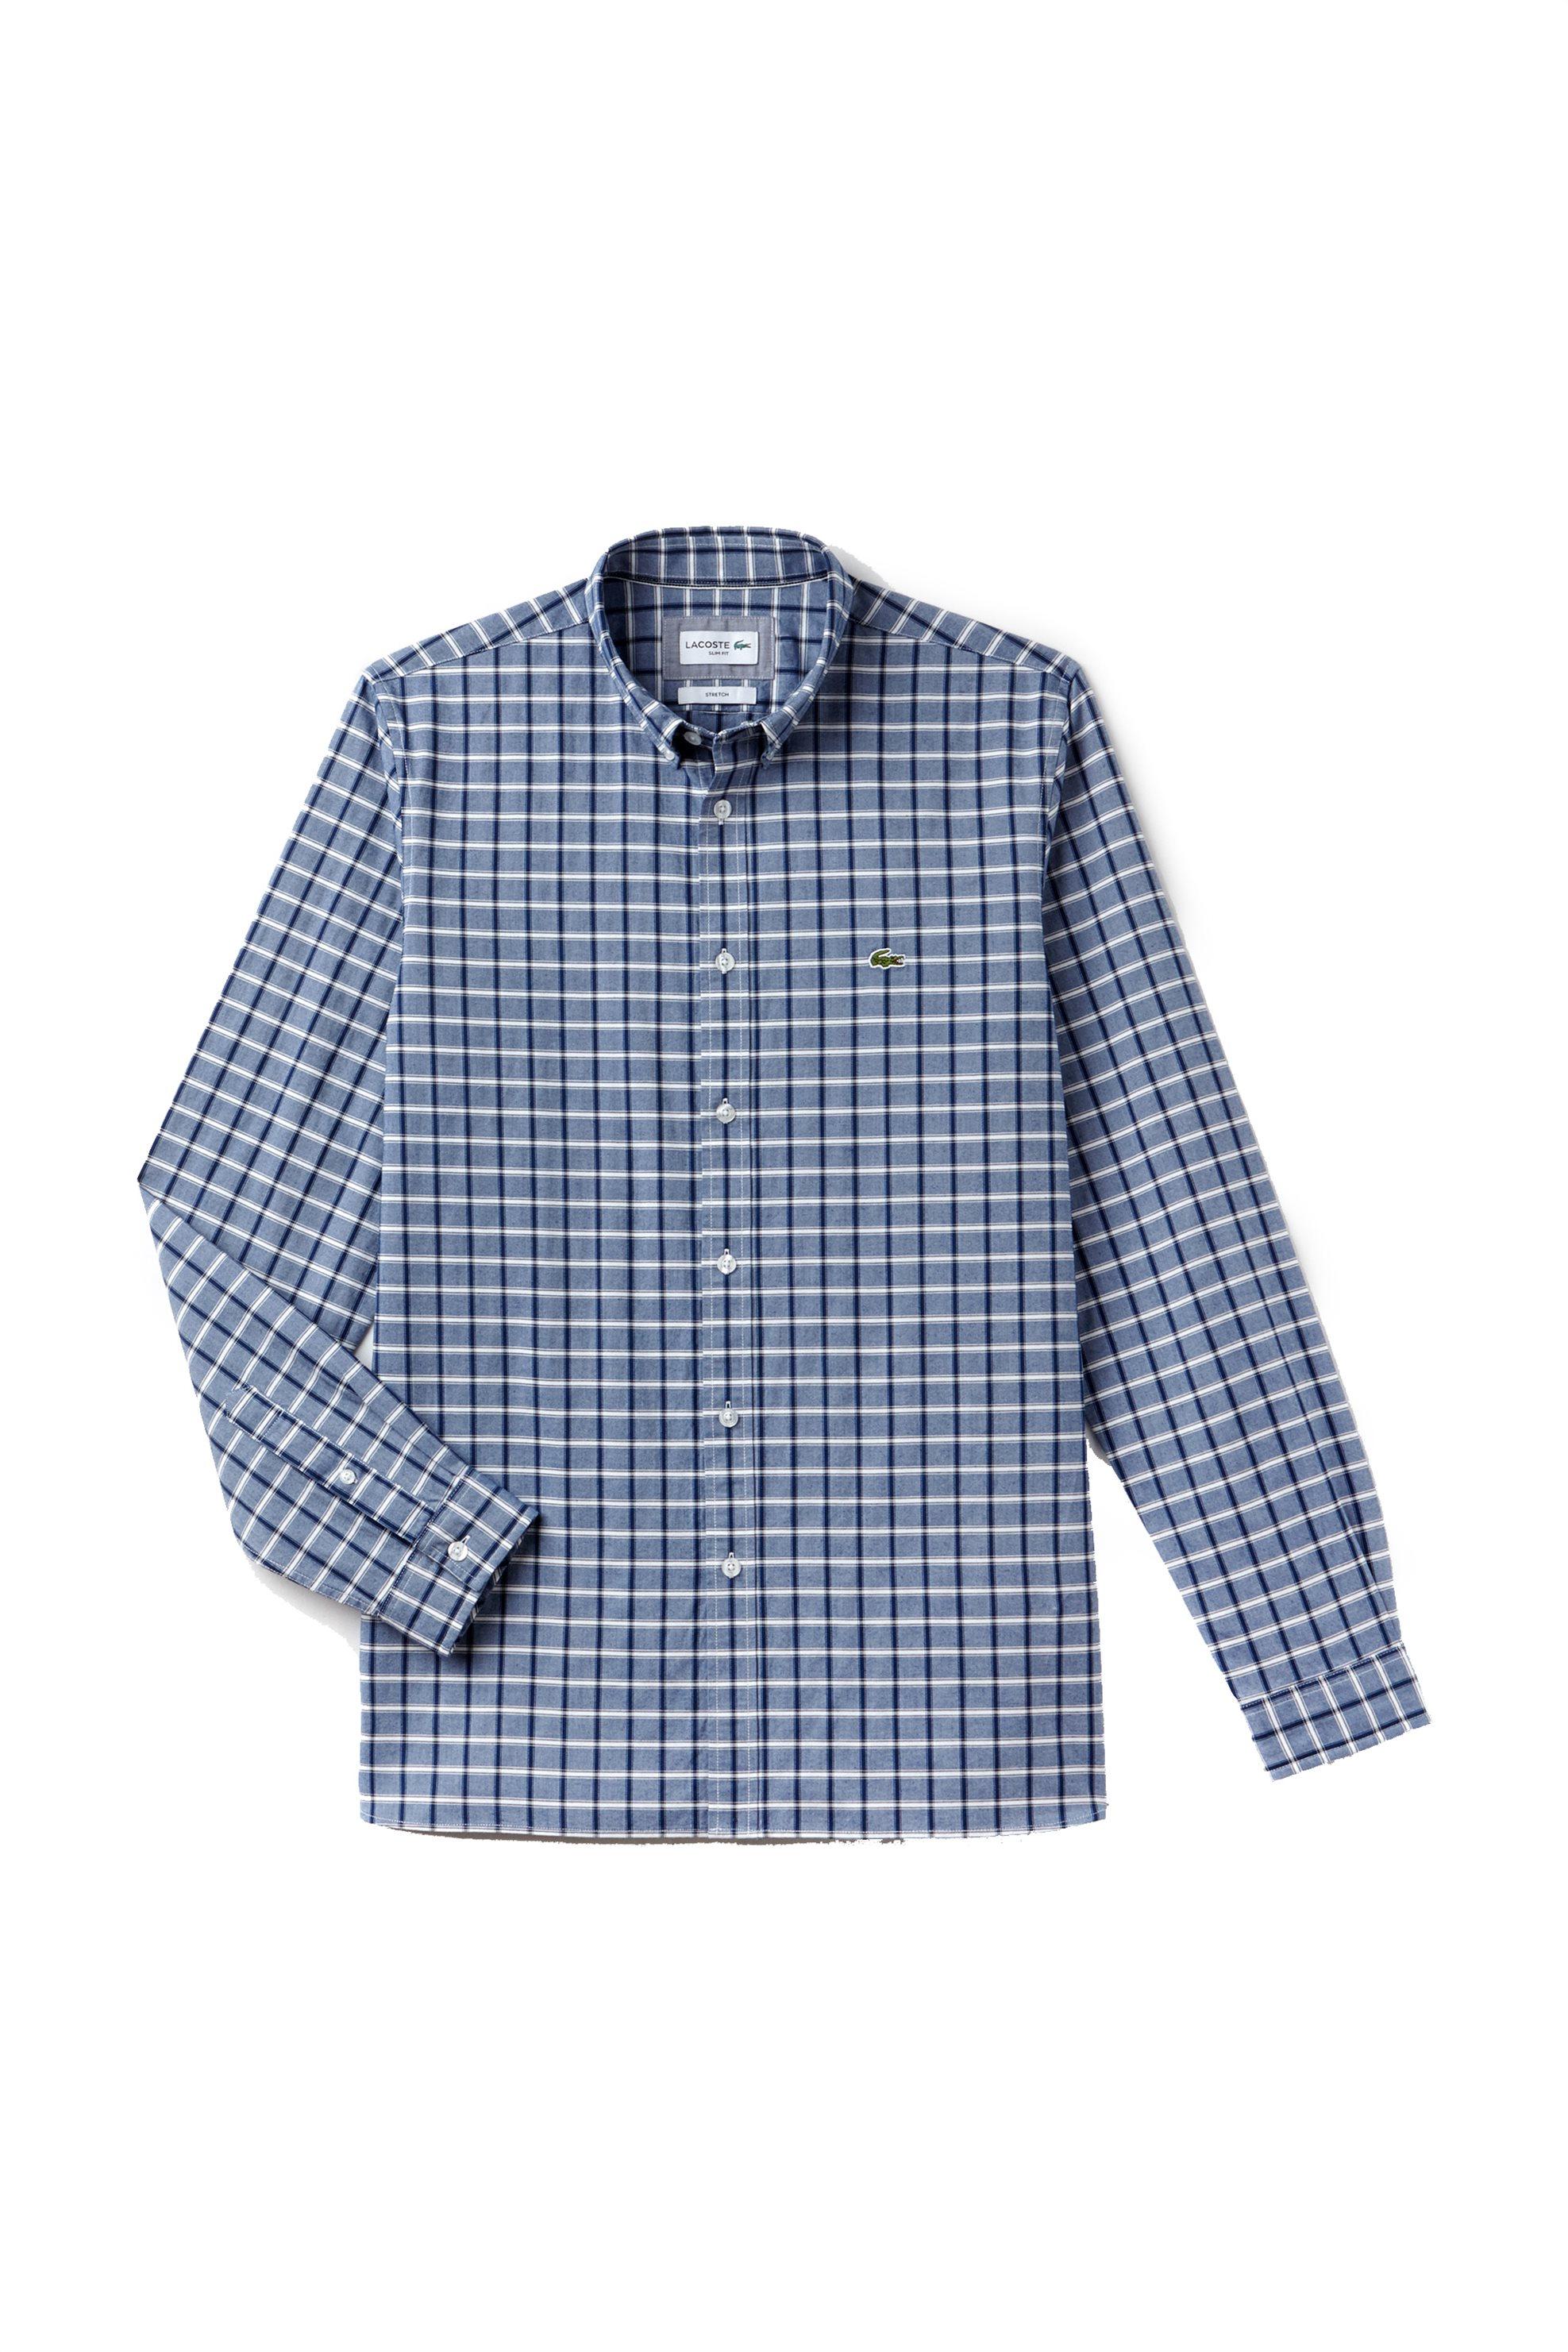 99e5b4132512 Ανδρικό καρό πουκάμισο Modern Heritage Collection Lacoste - CH4998 - Μπλε  Σκούρο